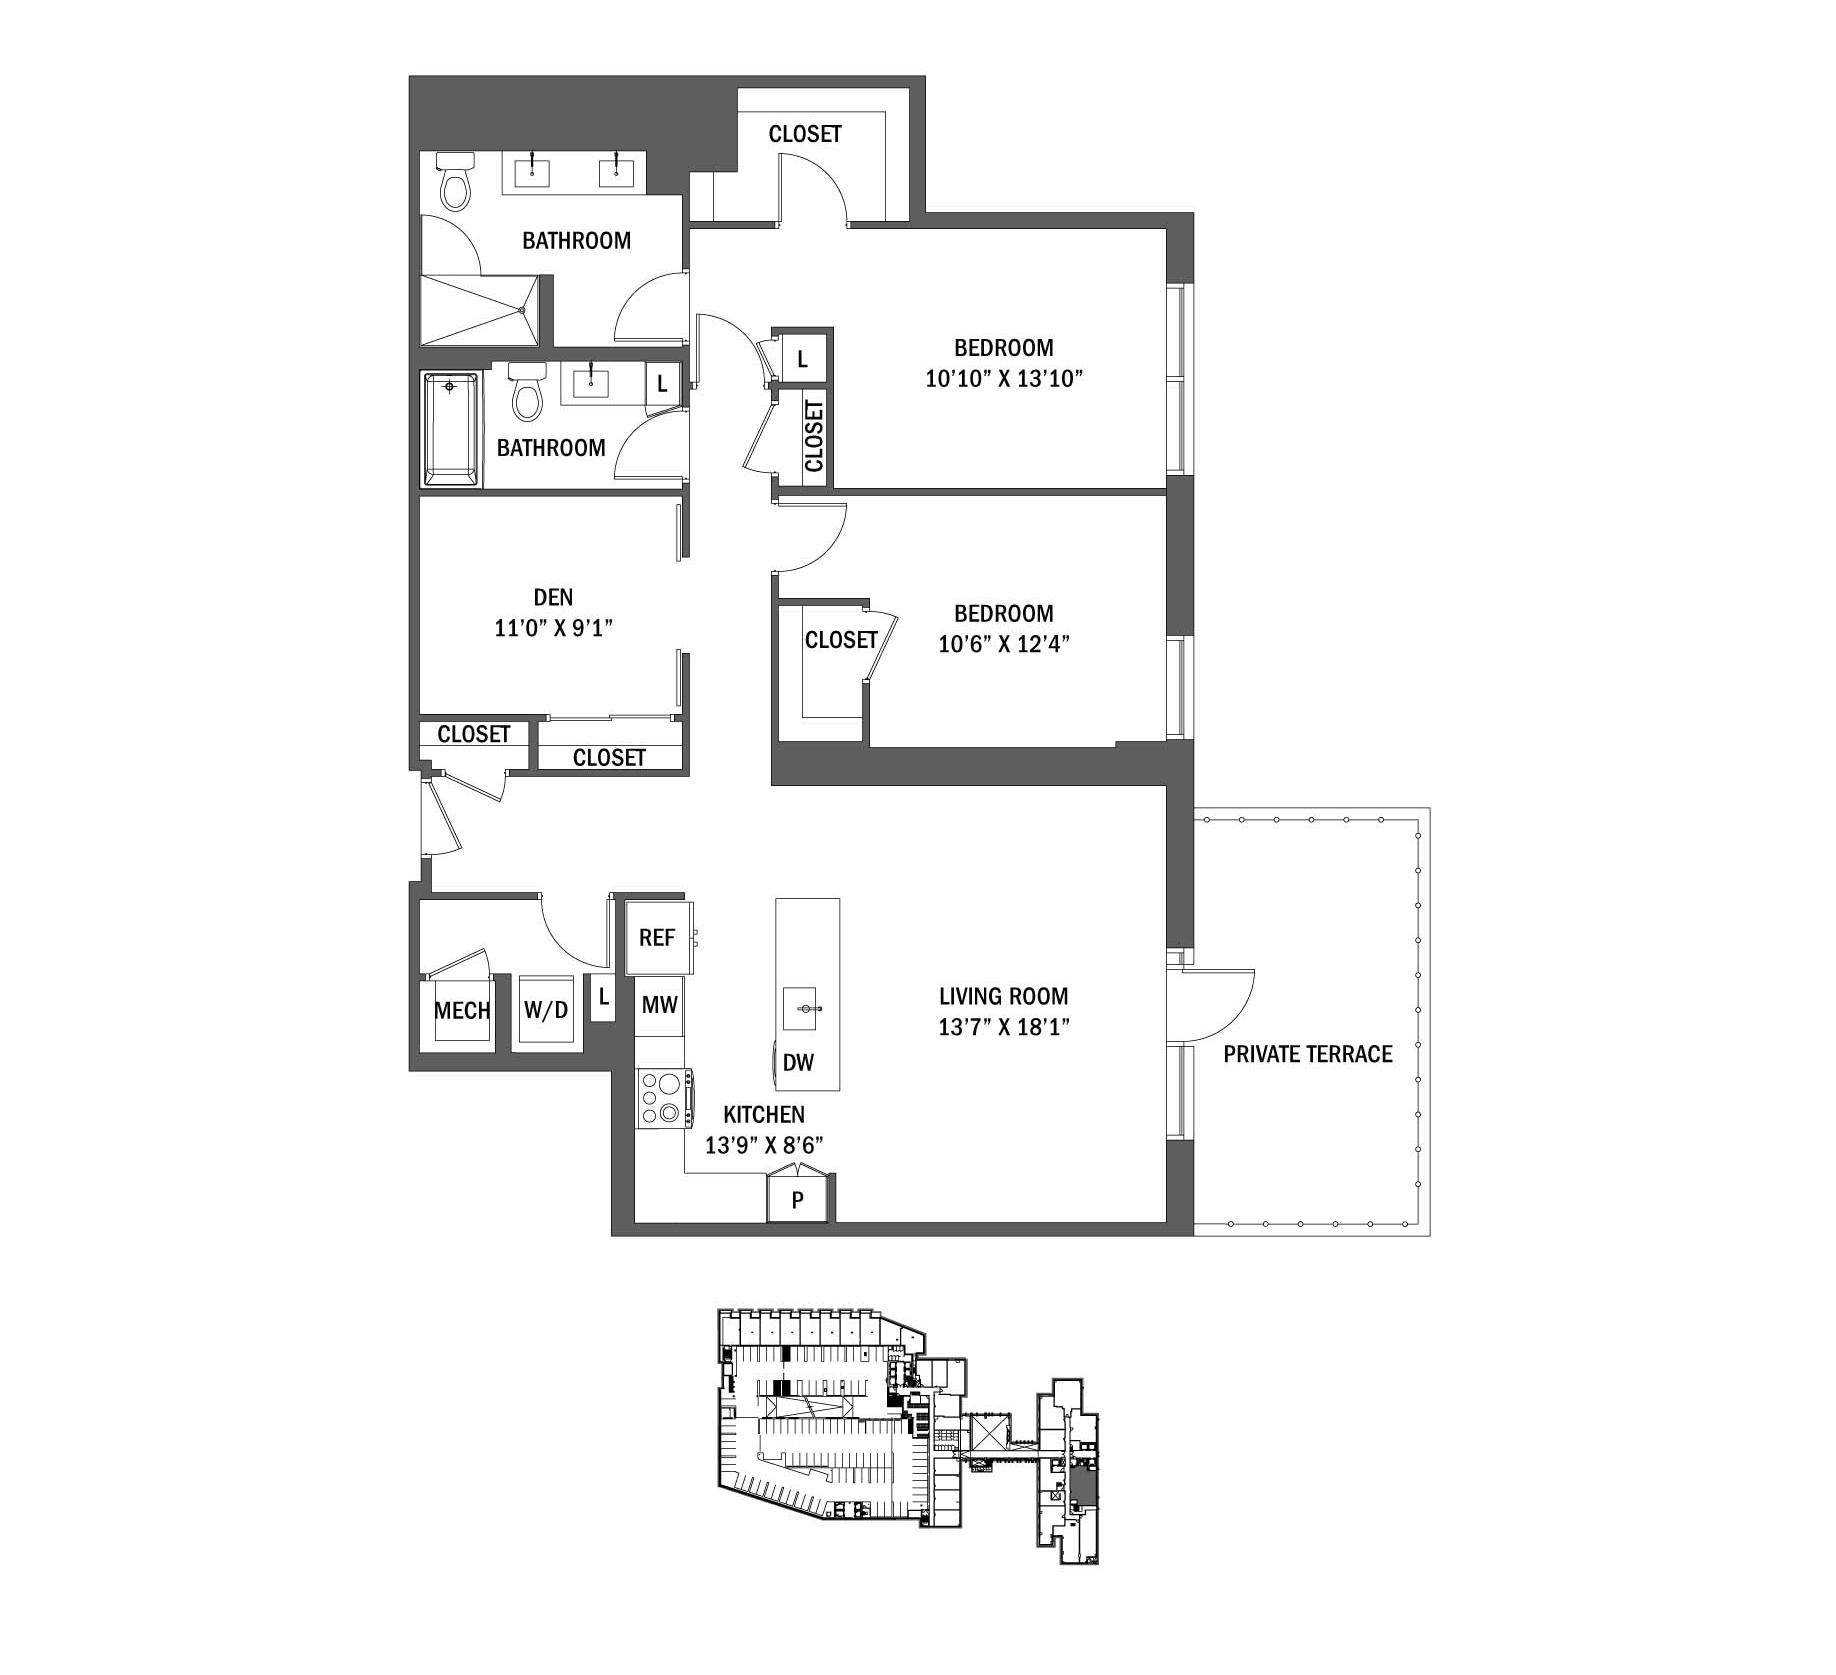 P0625338 789bcd03 e11 02p 2 floorplan